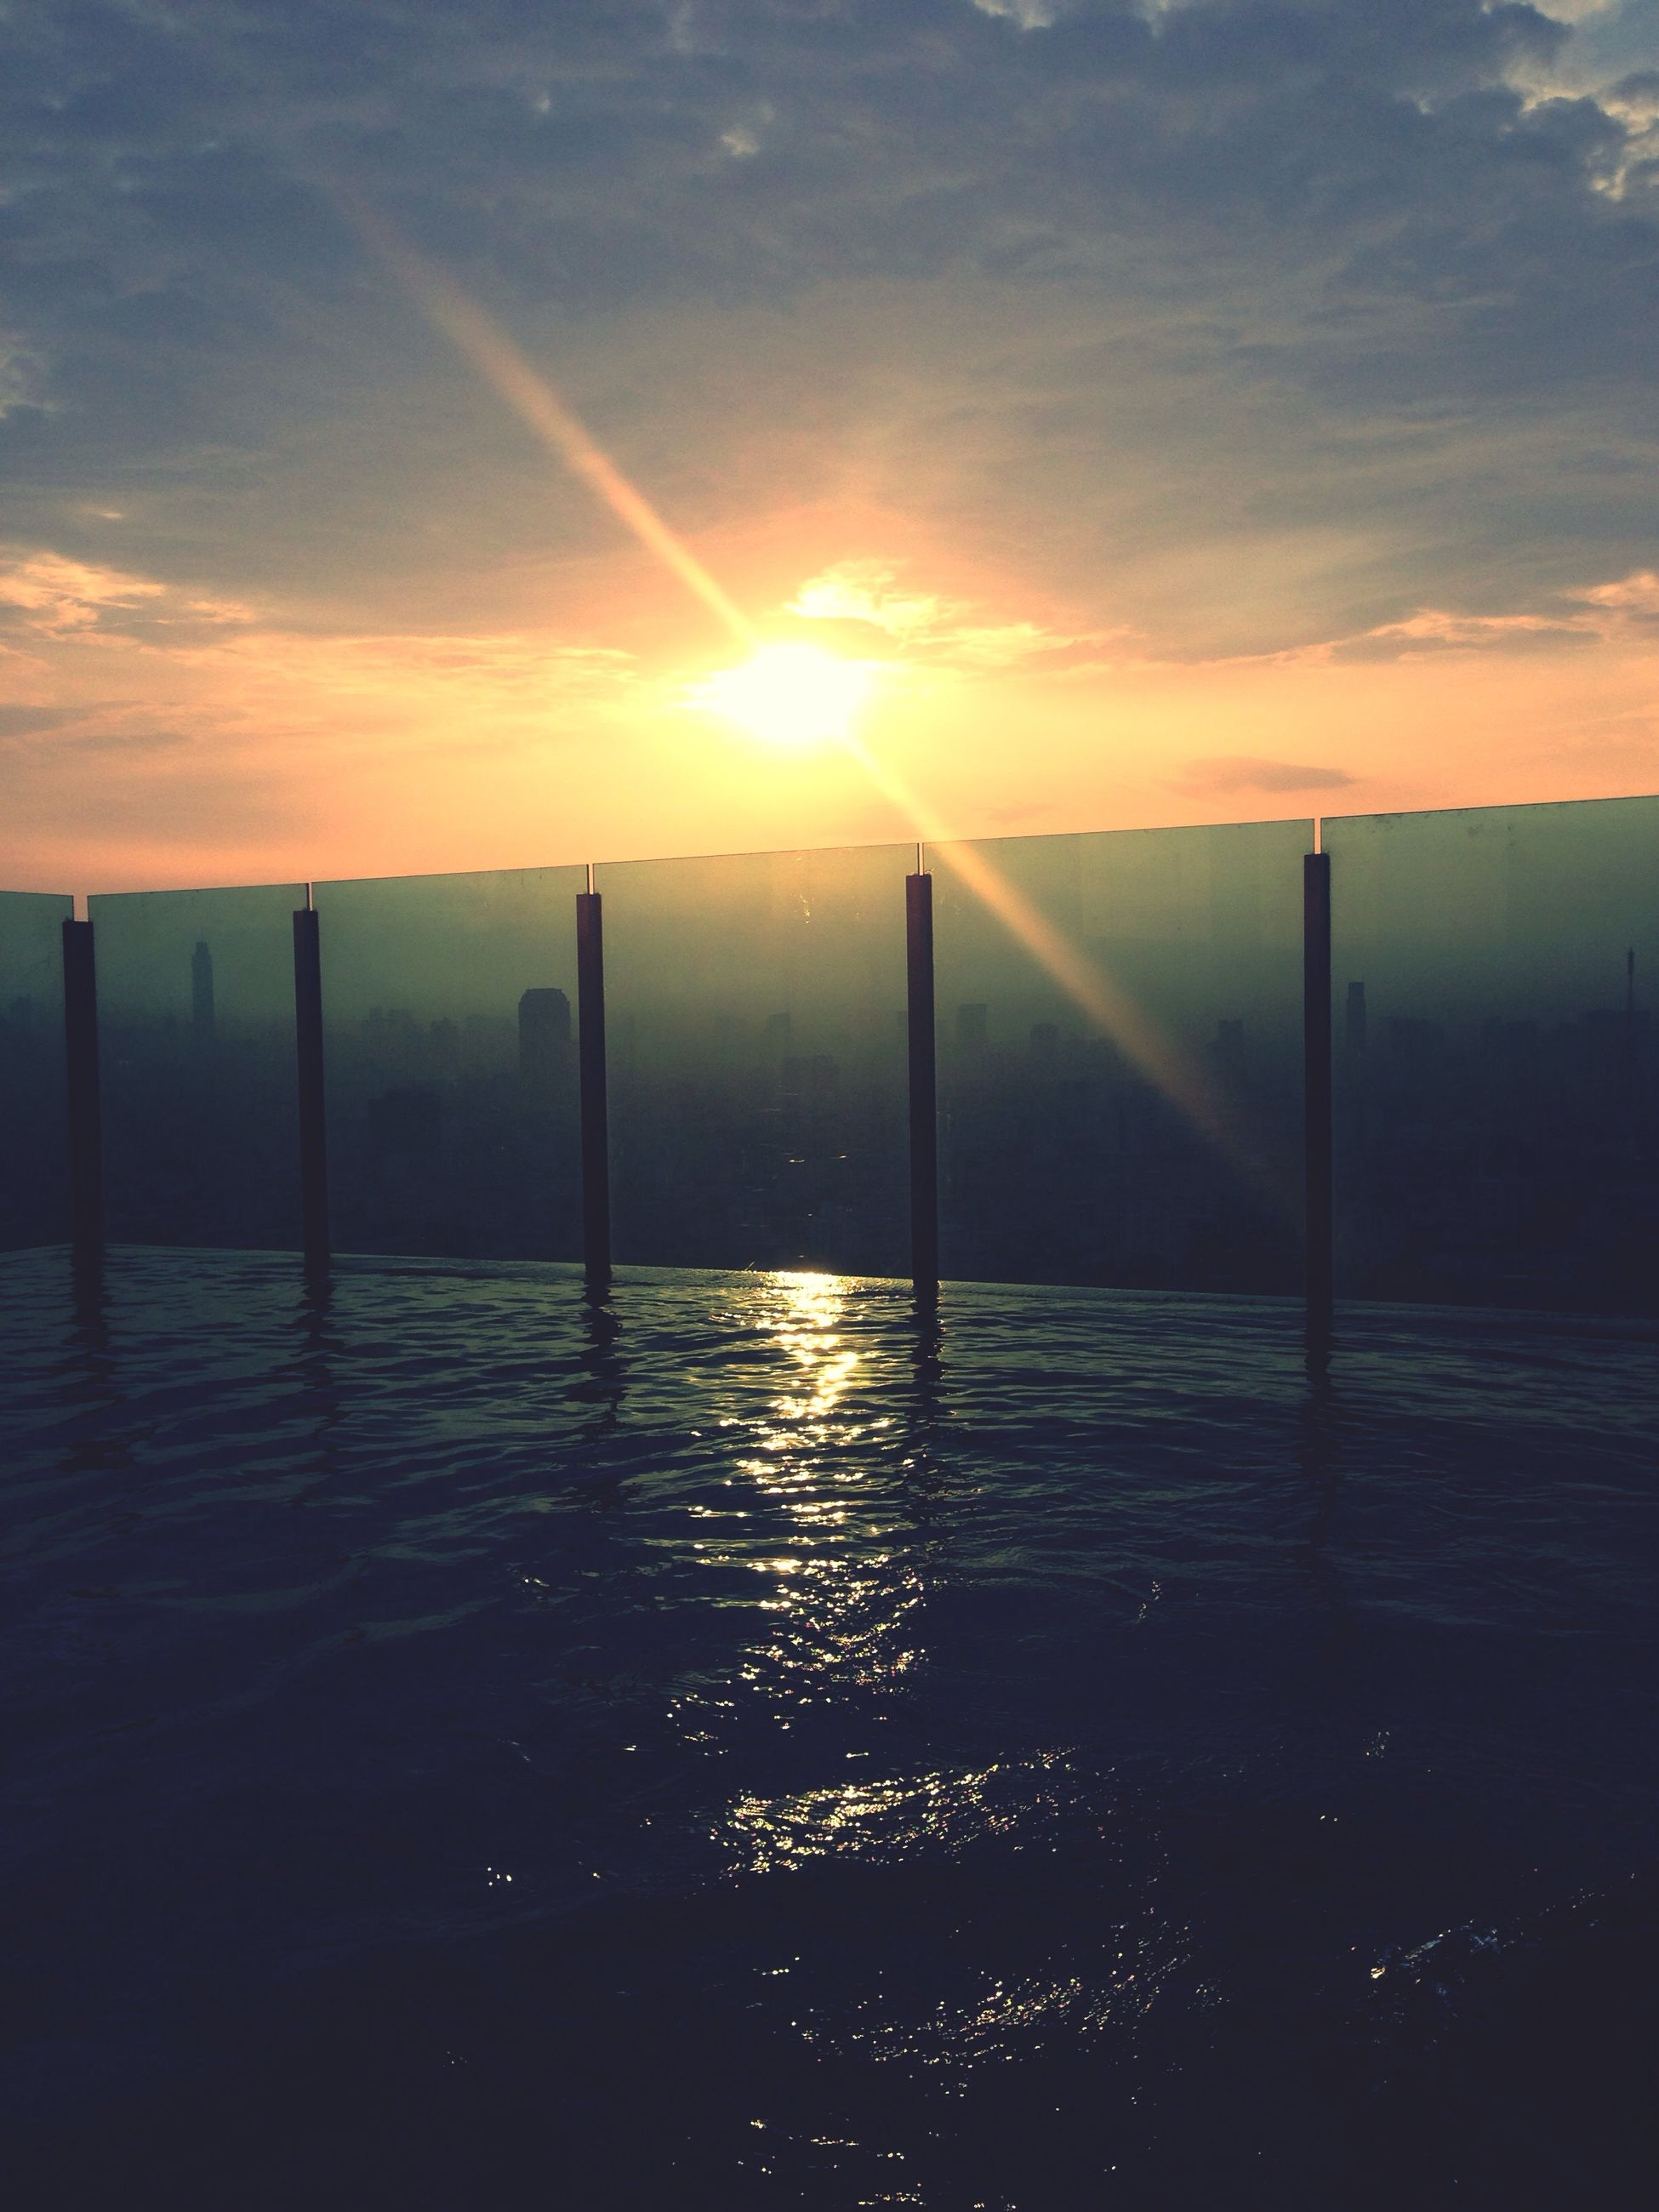 sunset, sun, water, sky, orange color, scenics, tranquil scene, tranquility, sea, beauty in nature, idyllic, sunlight, nature, reflection, silhouette, cloud - sky, horizon over water, cloud, pier, sunbeam